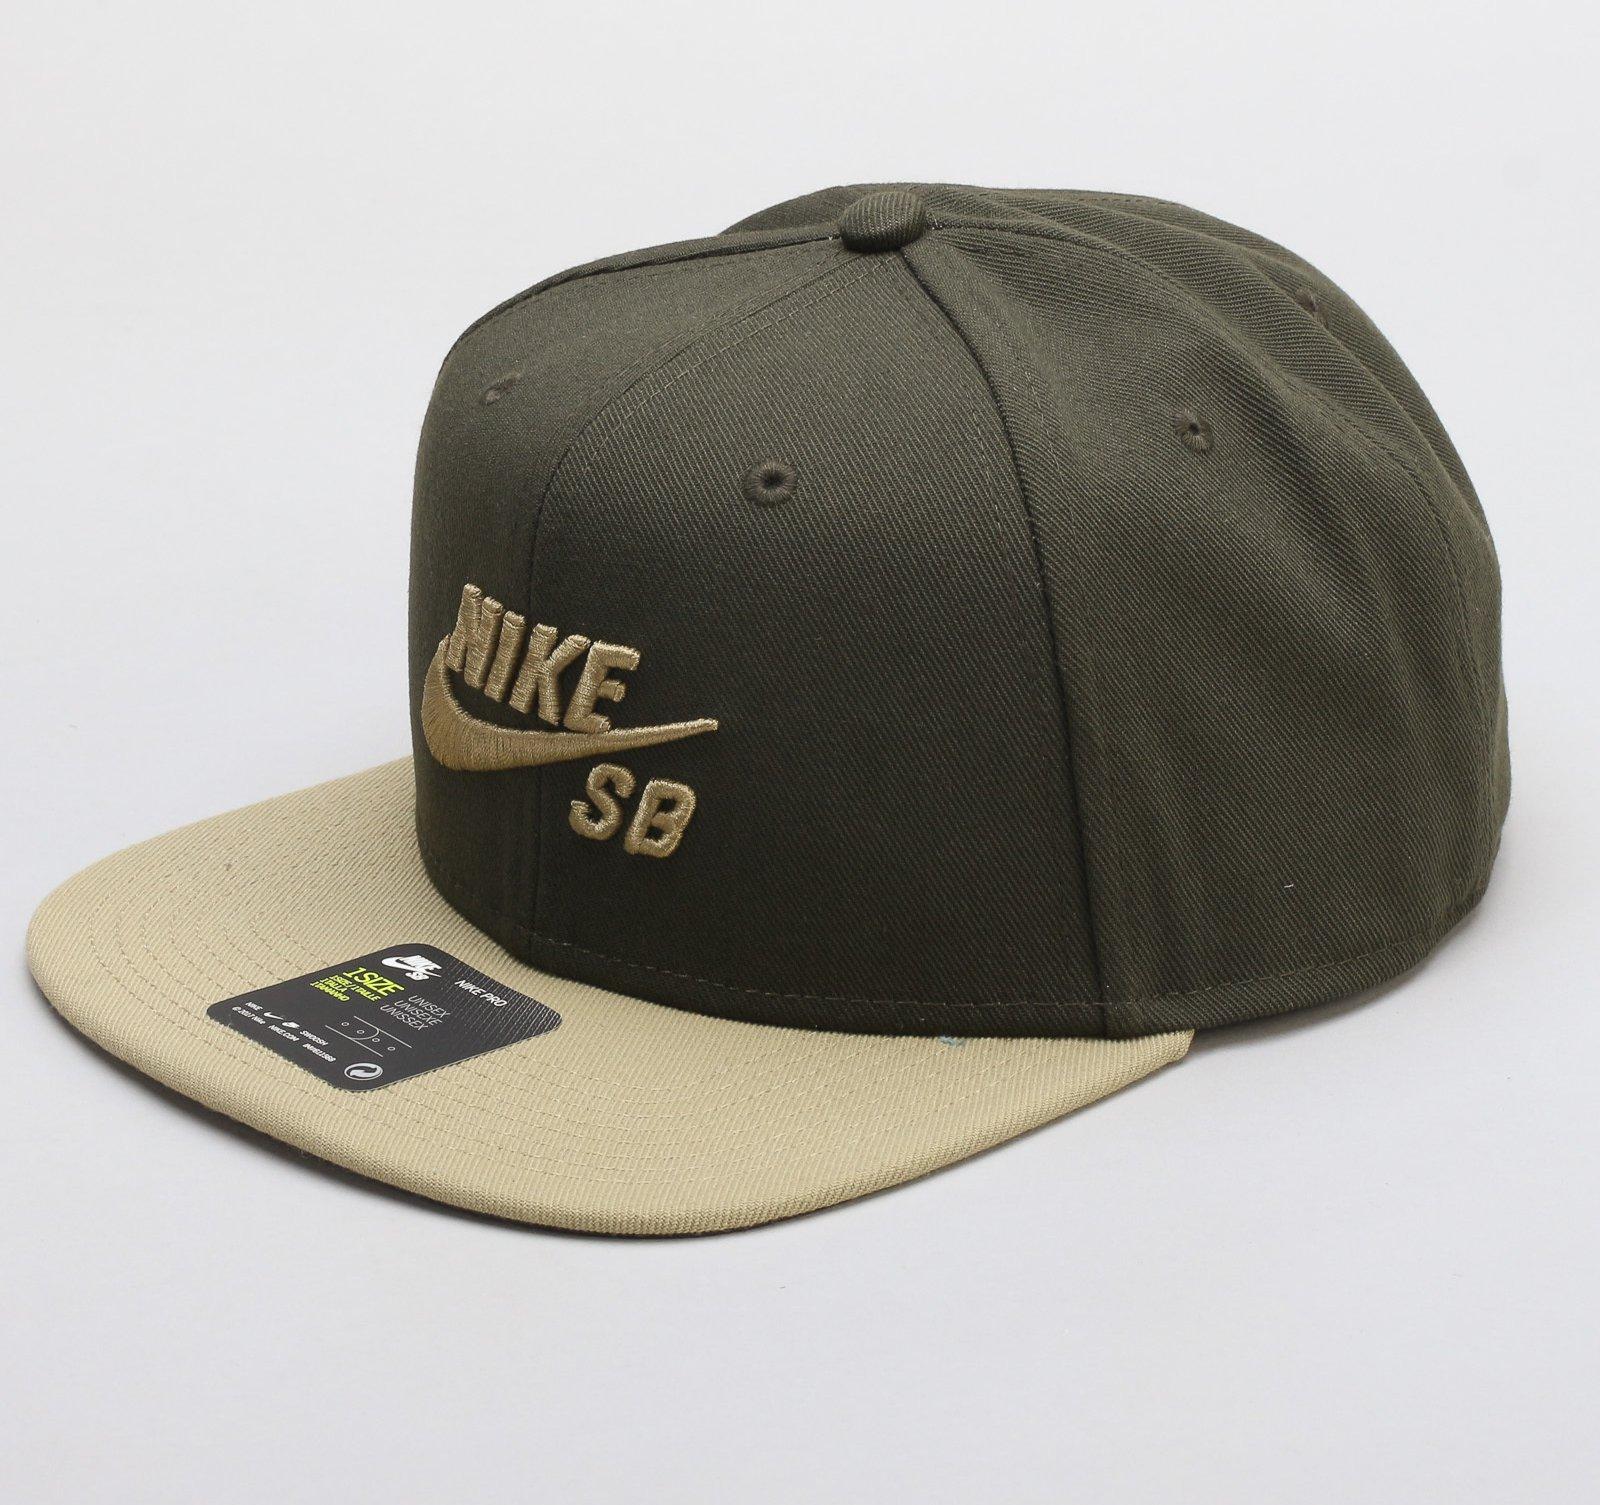 Nike SB Pro Cap Sequoia Neutral Olive • Zboží.cz bd1d210a7c